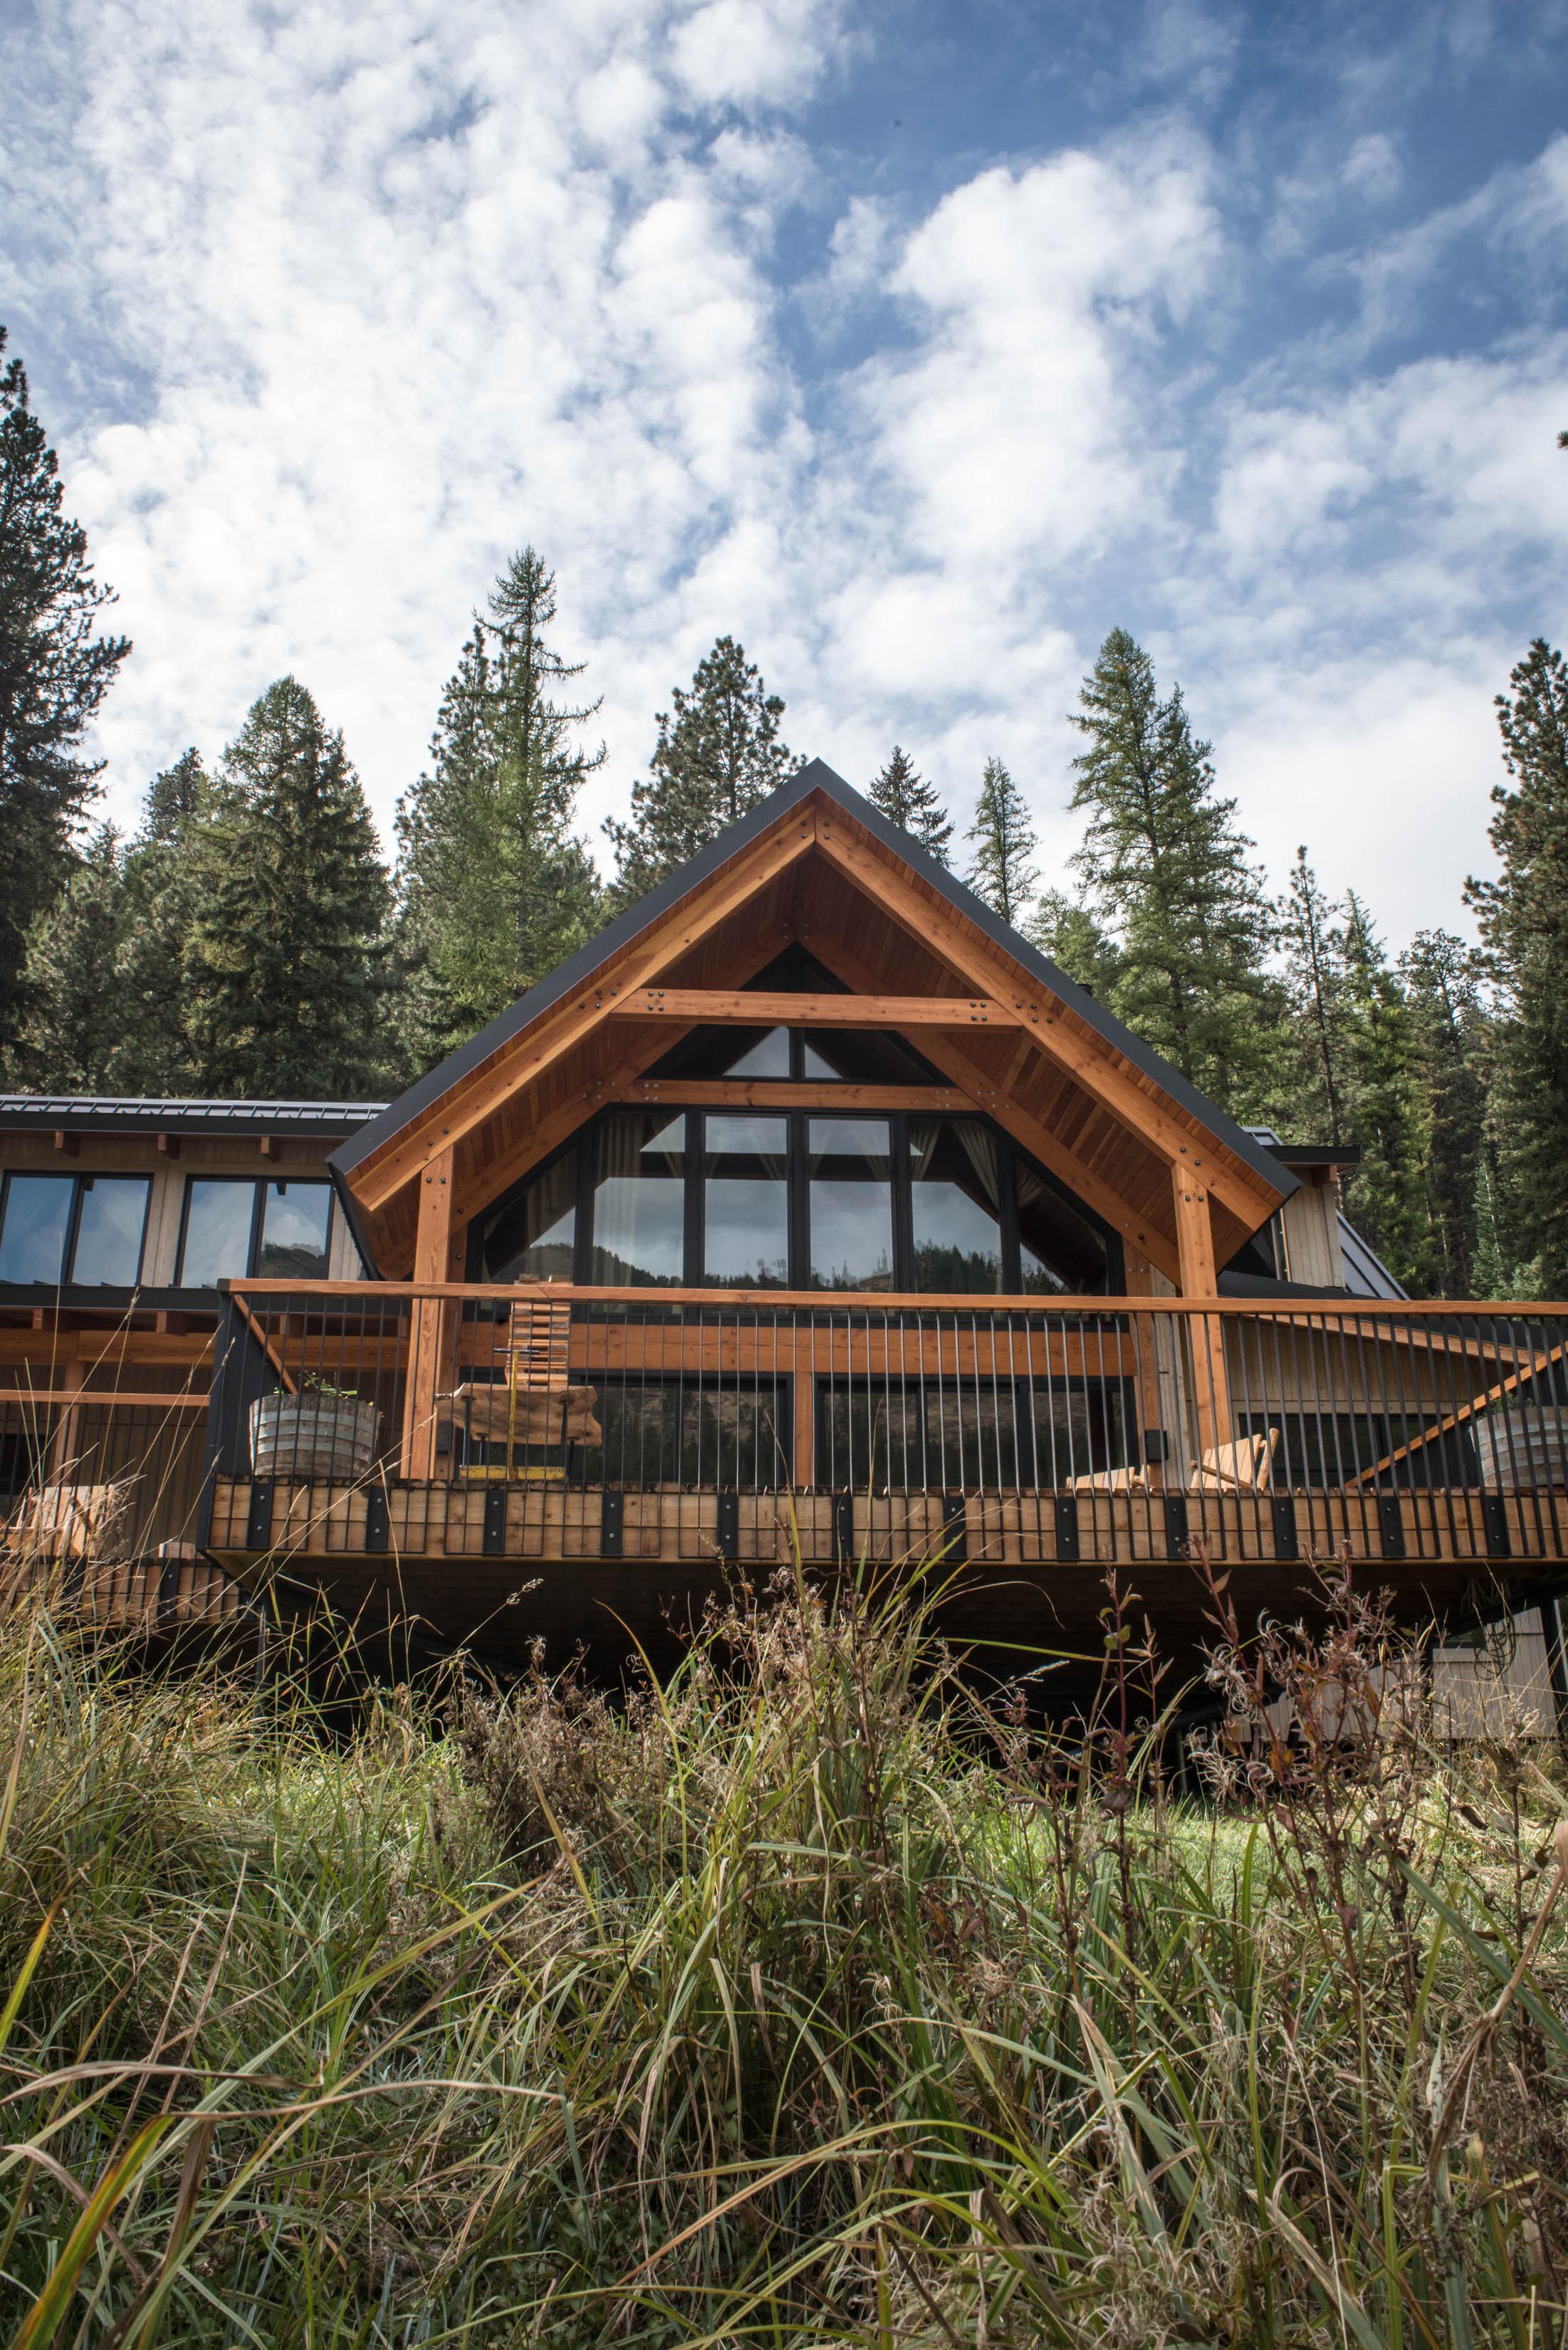 Minam_River_Lodge_Wallowa_Mountains_Eagle_Cap_Wilderness_Oregon_Autumn_2017_Please_Credit_Talia_Jean_Galvin-117.jpg